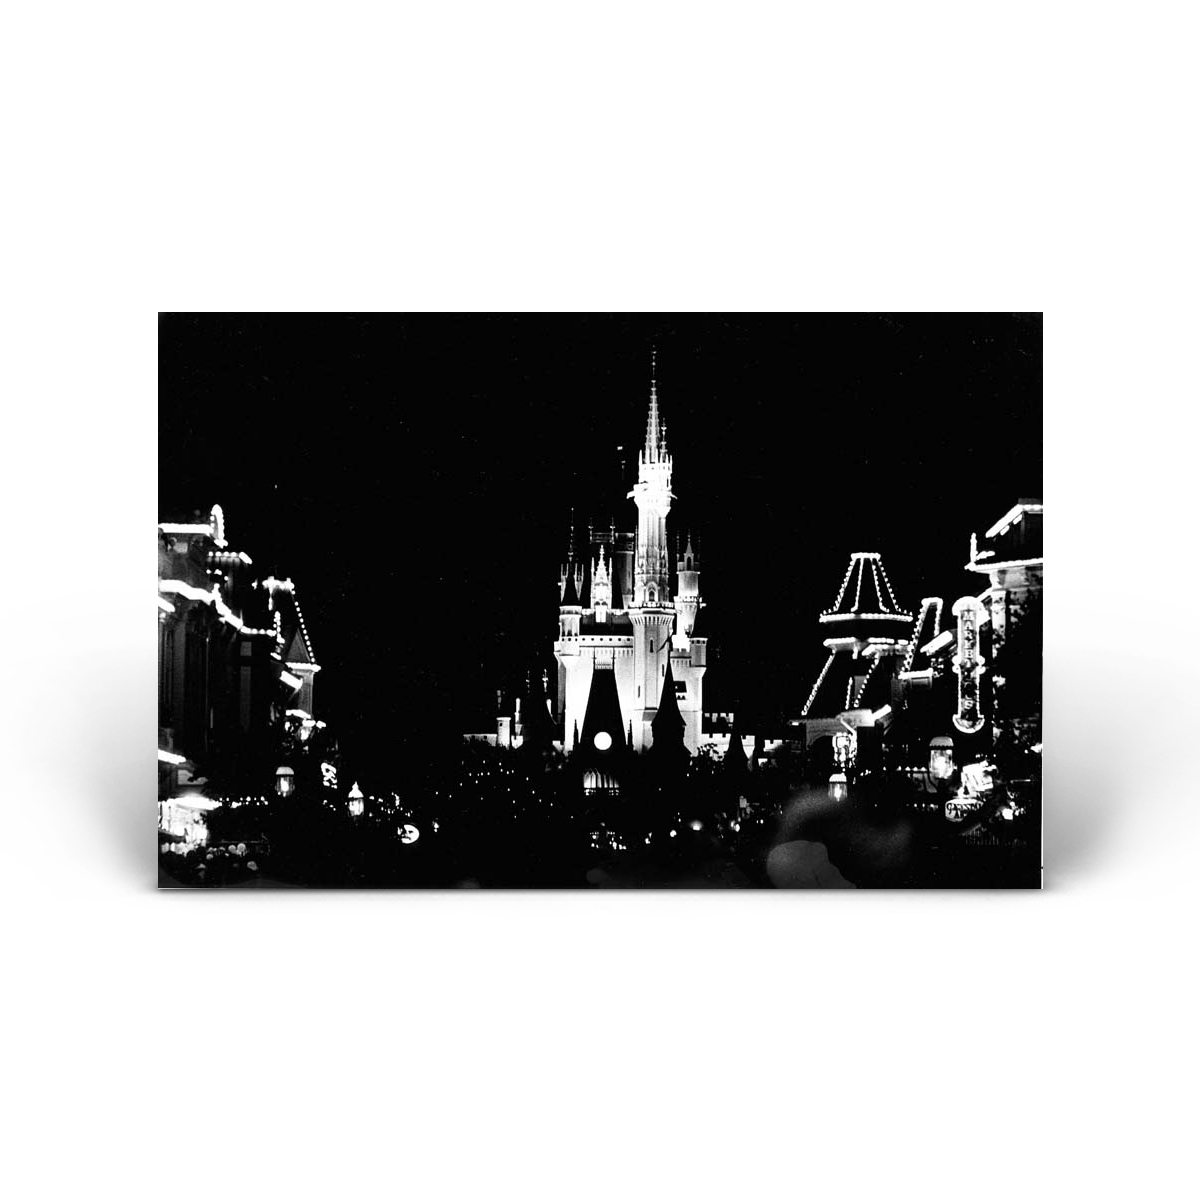 Cinderella's Castle: Light Up the Night